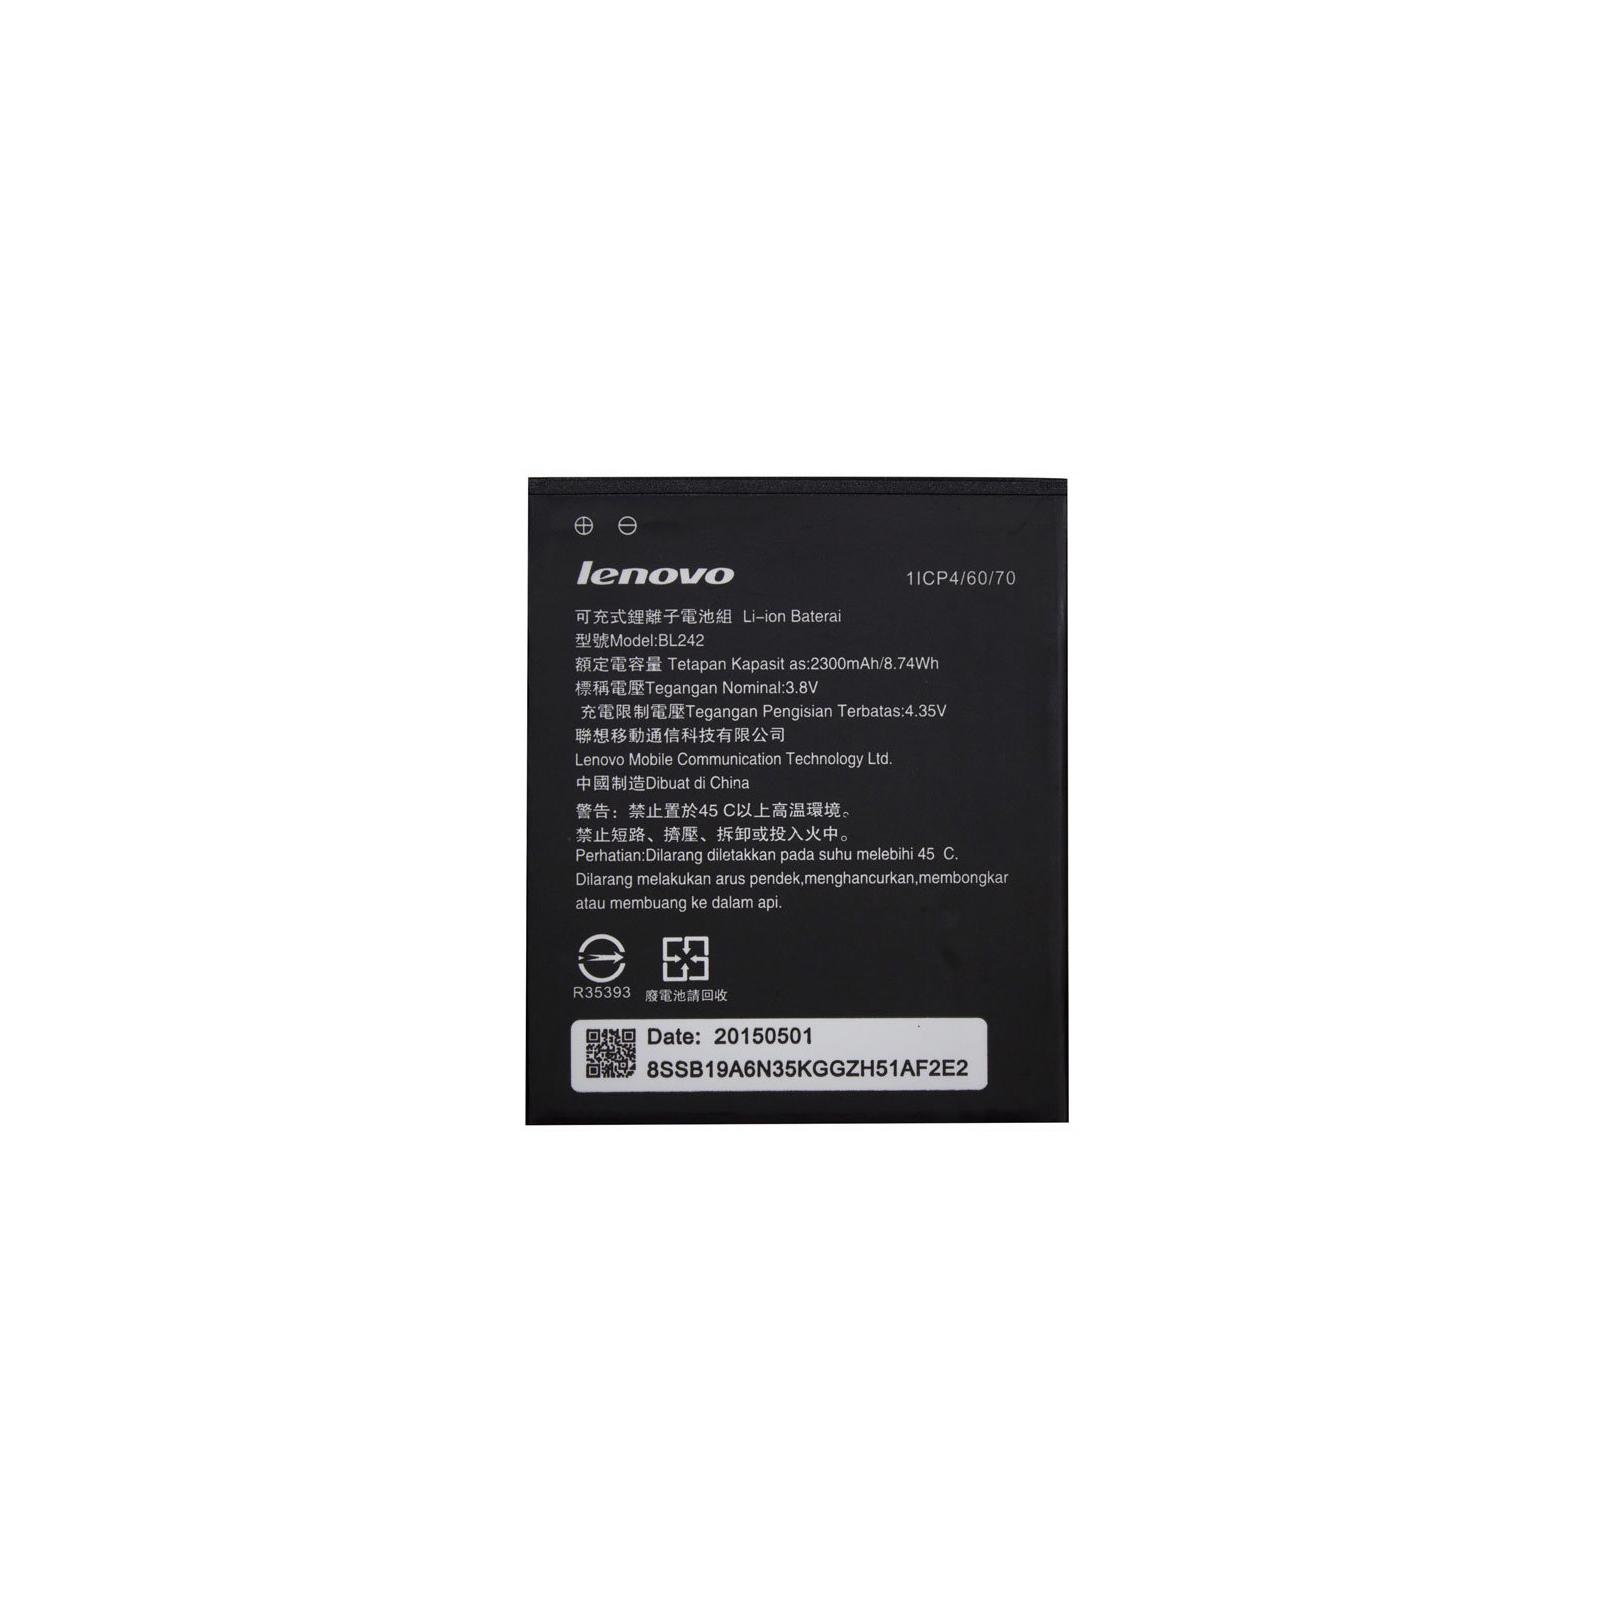 Аккумуляторная батарея Lenovo for A6000/K3/K30 (BL-242 / 37269)